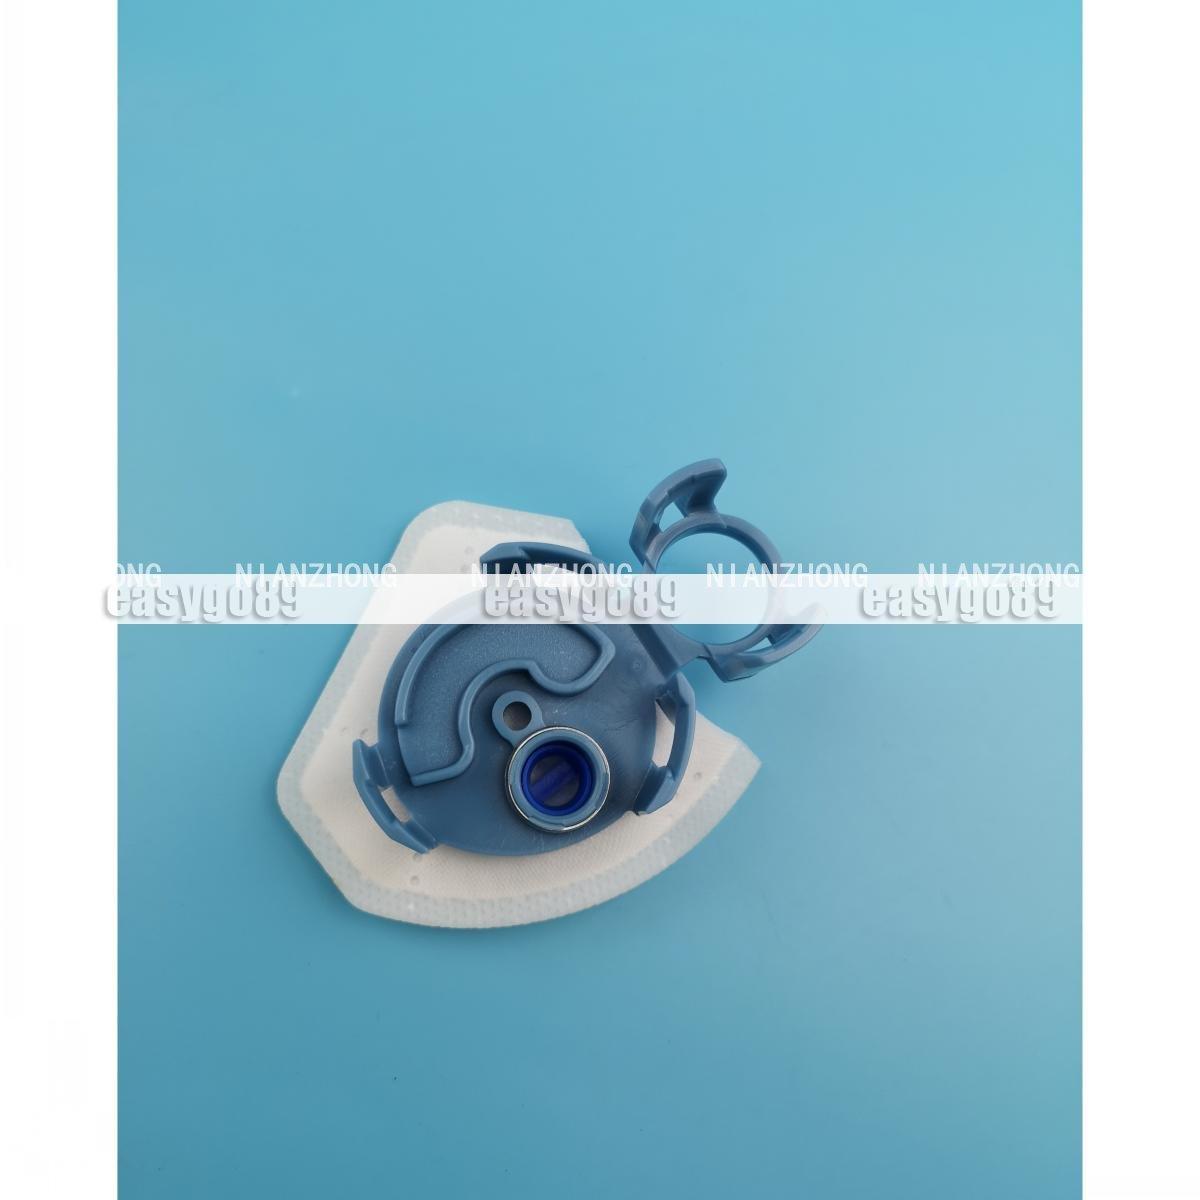 hight resolution of fuel filter core pump network pump strainer lfb6 13 ze1 fits mazda 5 8 cx 7 cx9